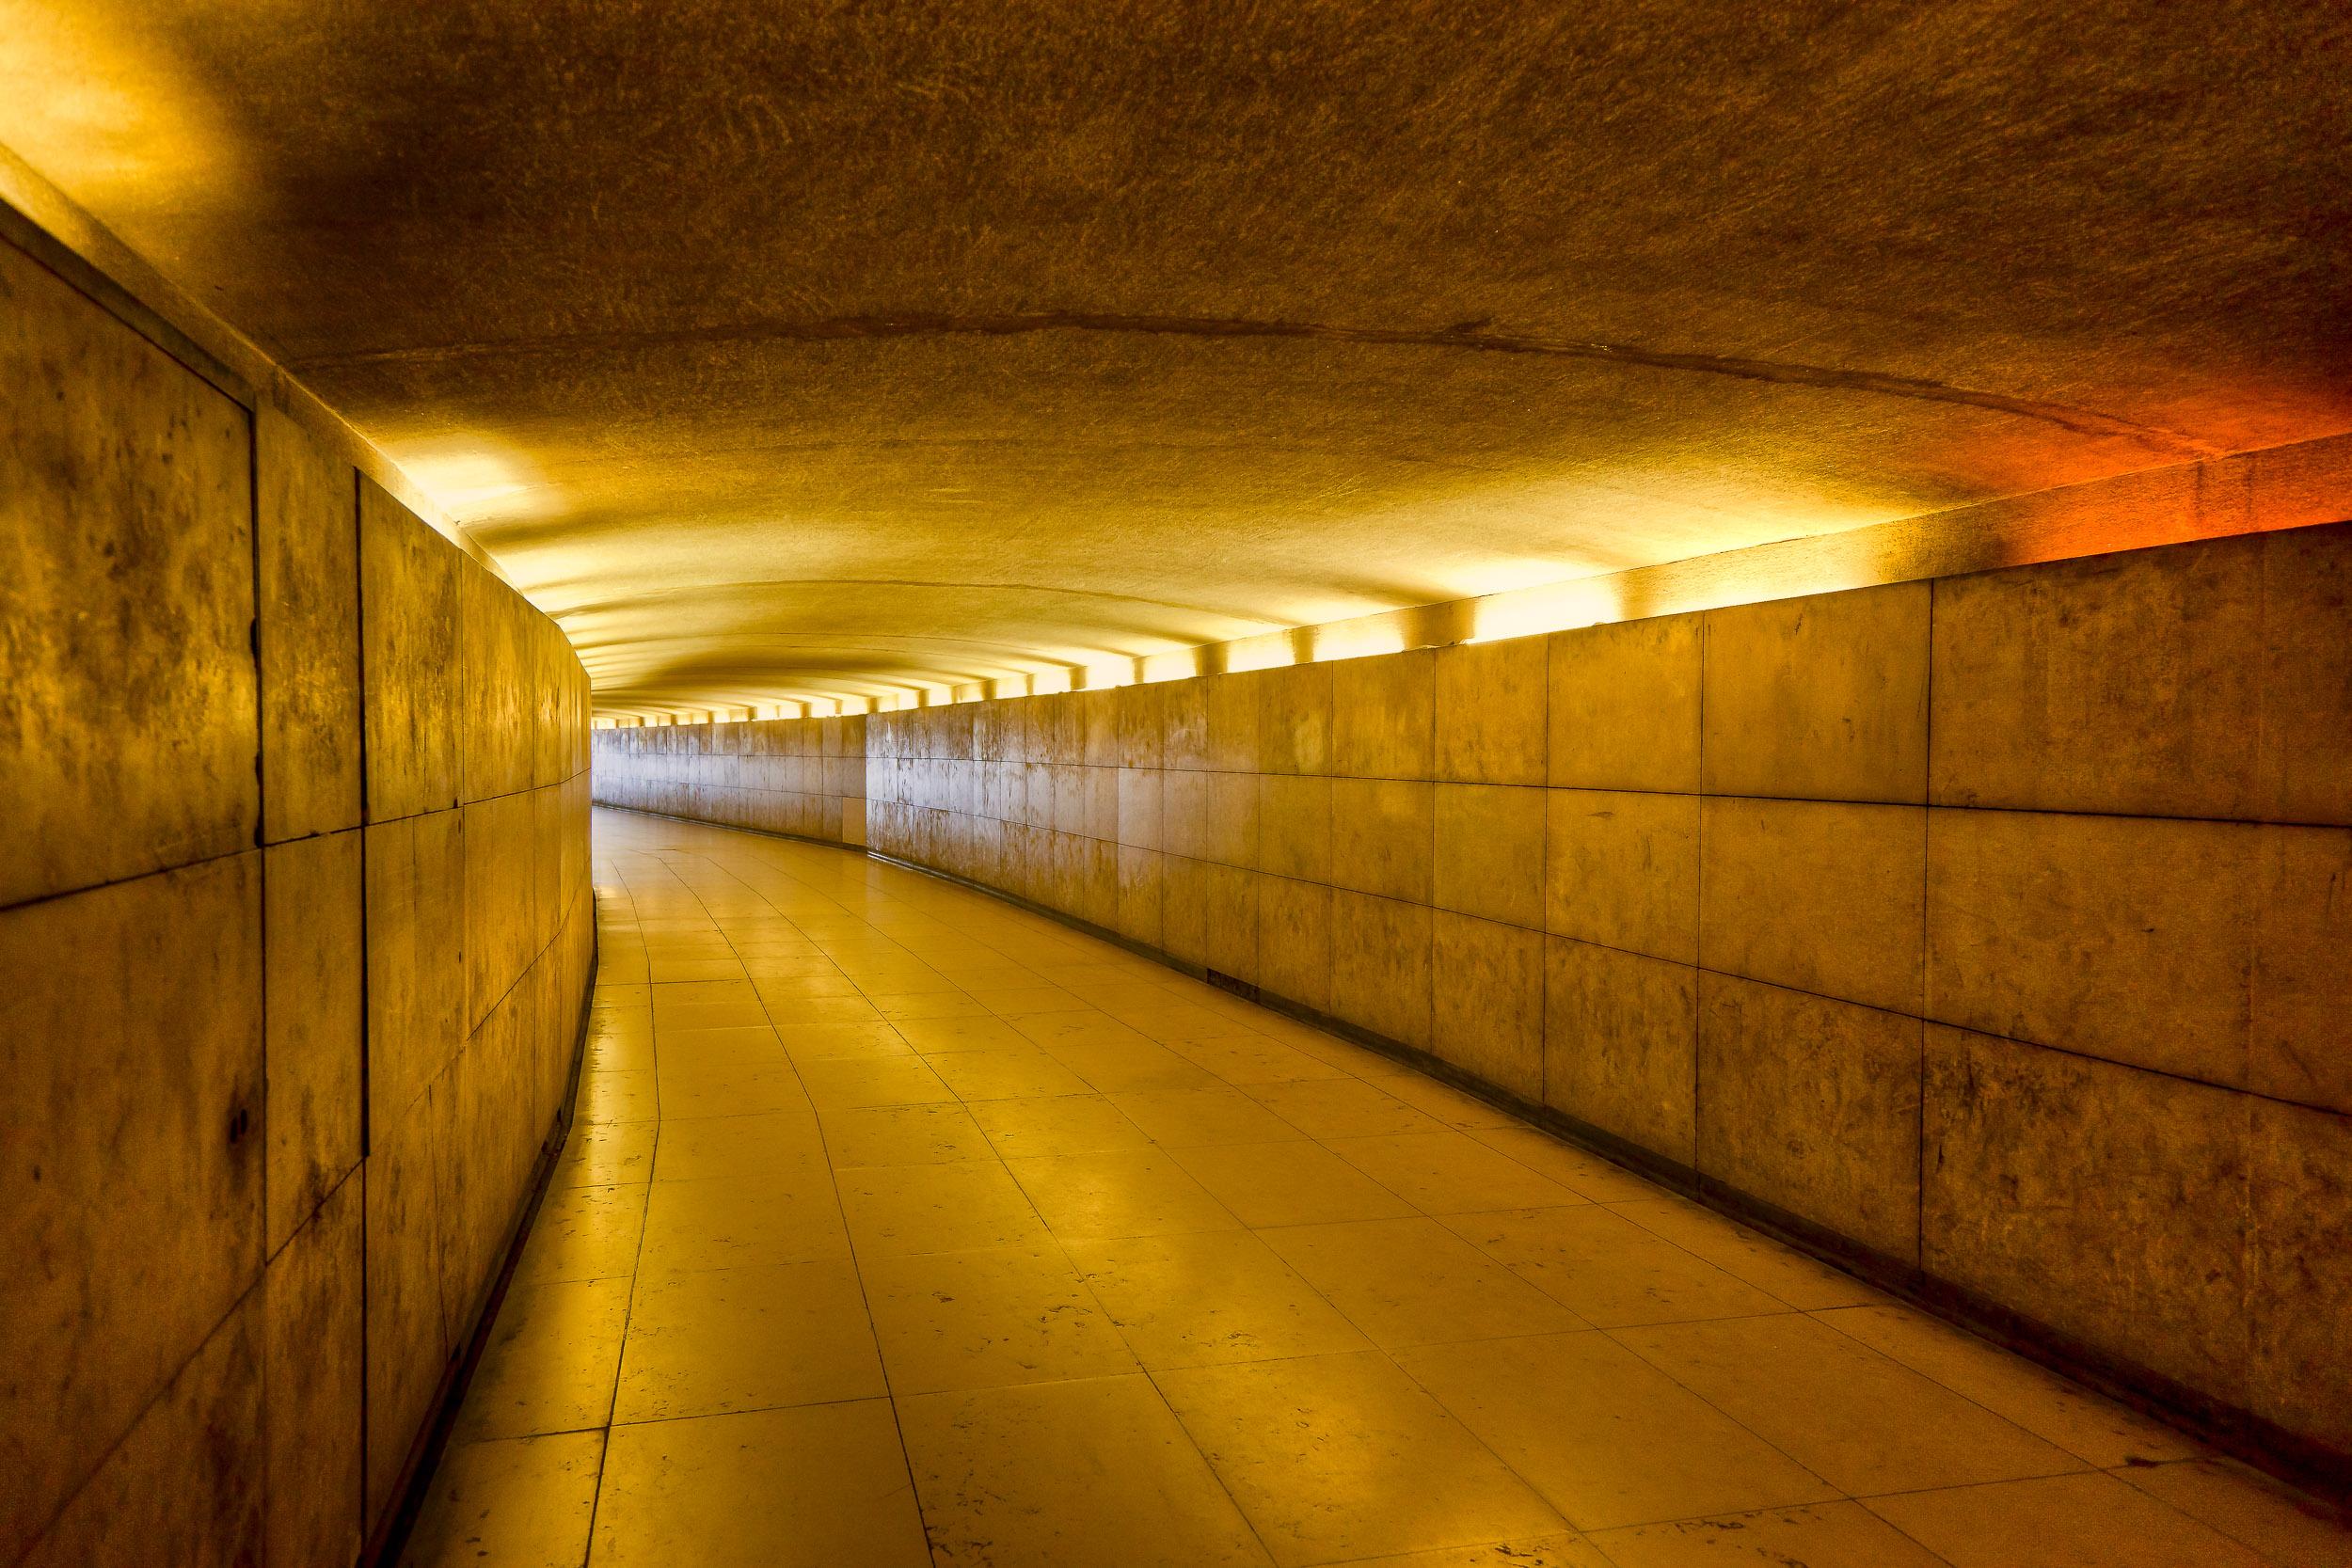 Warm artificial light  illuminates a  subway  in  Paris, France